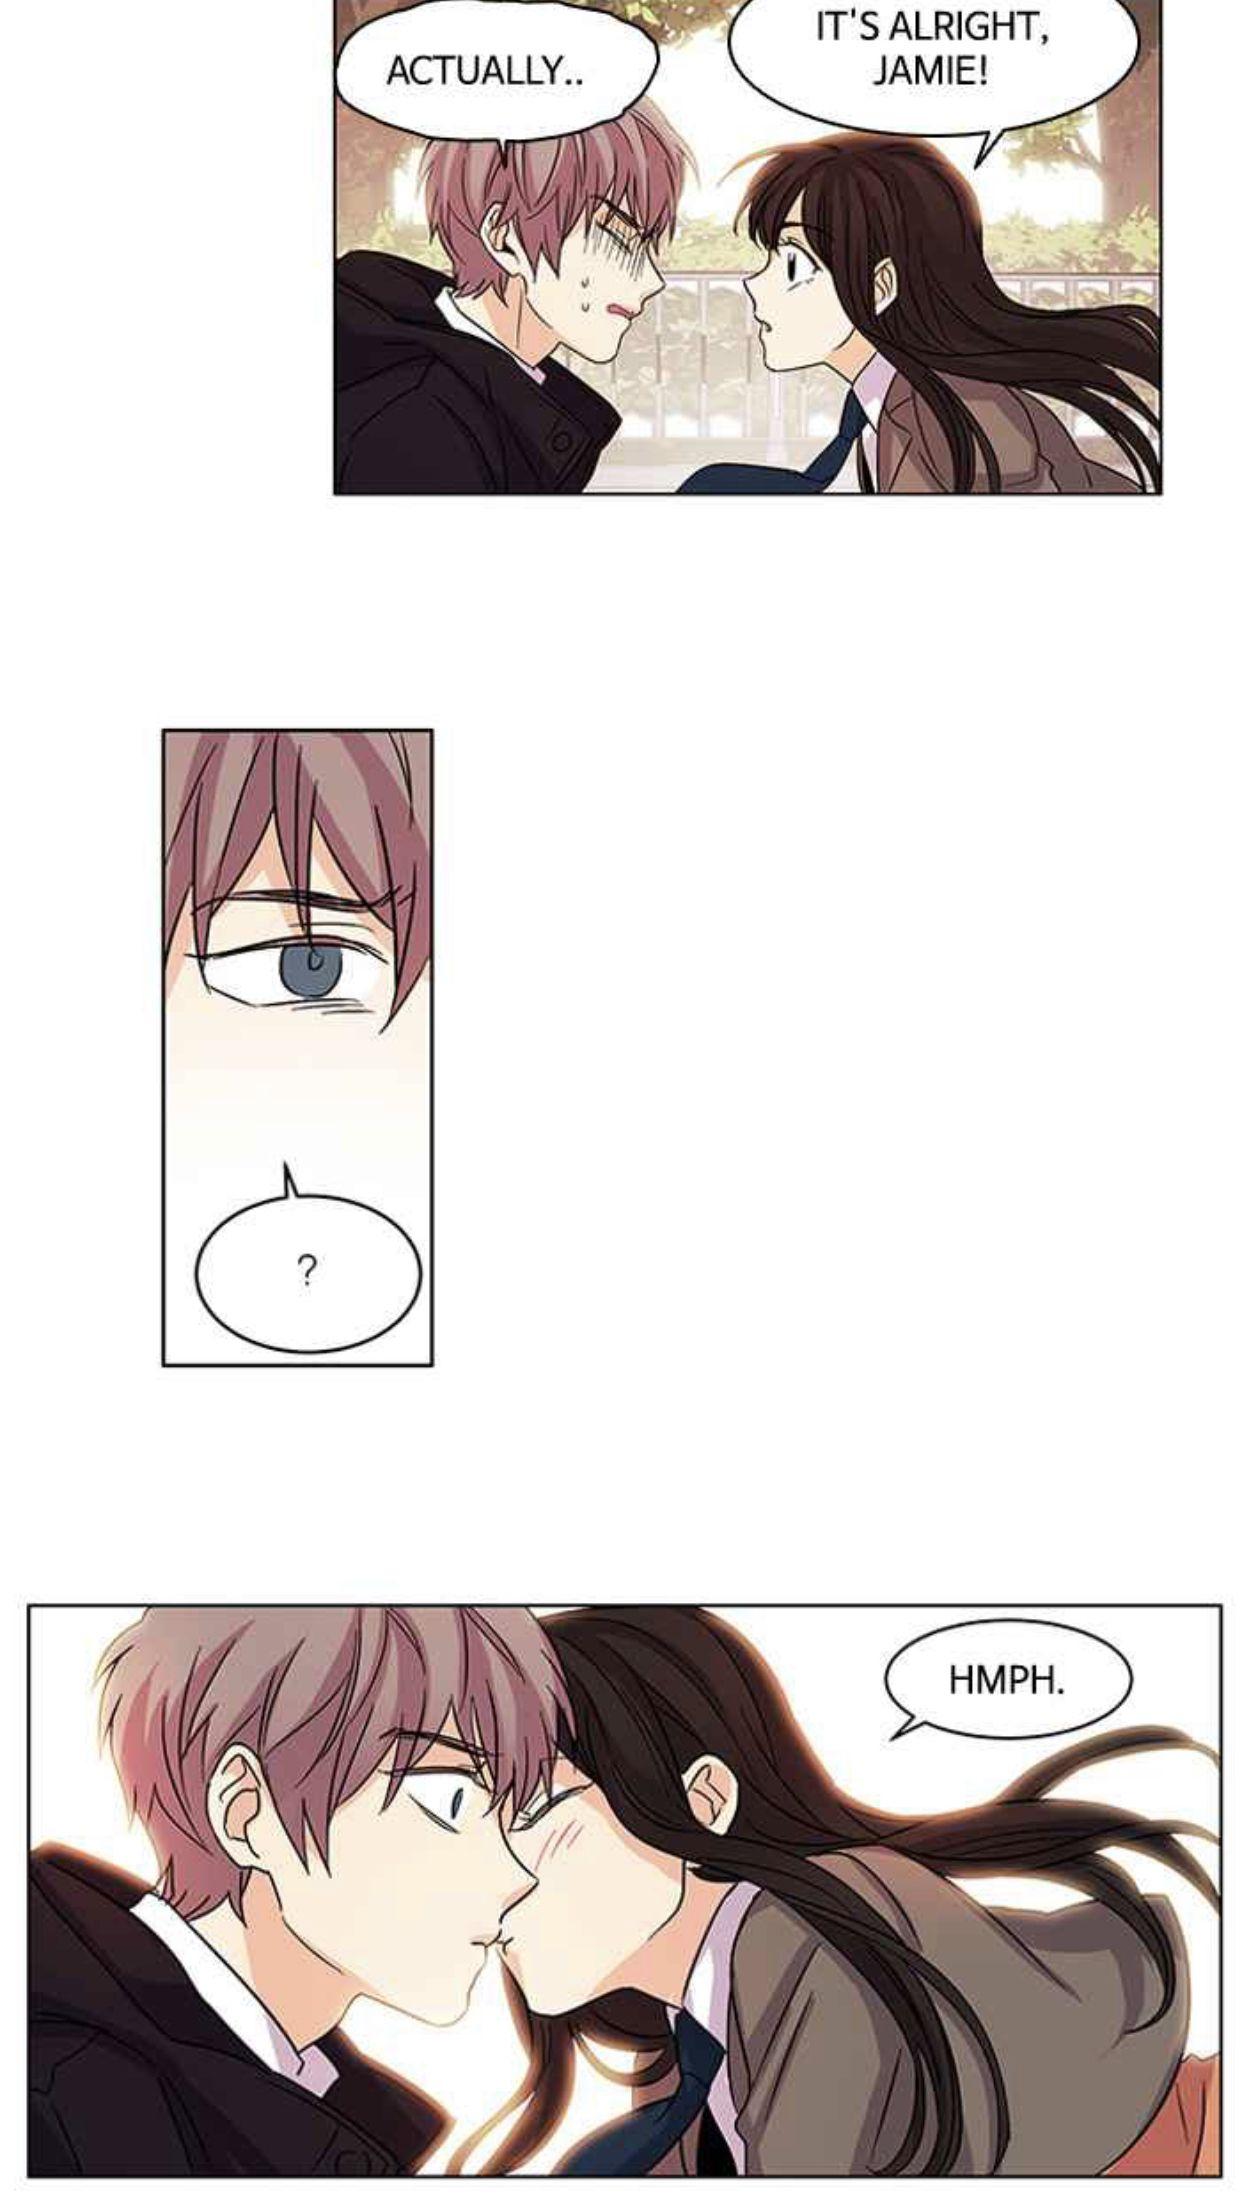 Pin by MeMe MaChiNcE on Oh! Holy (webtoon) Webtoon